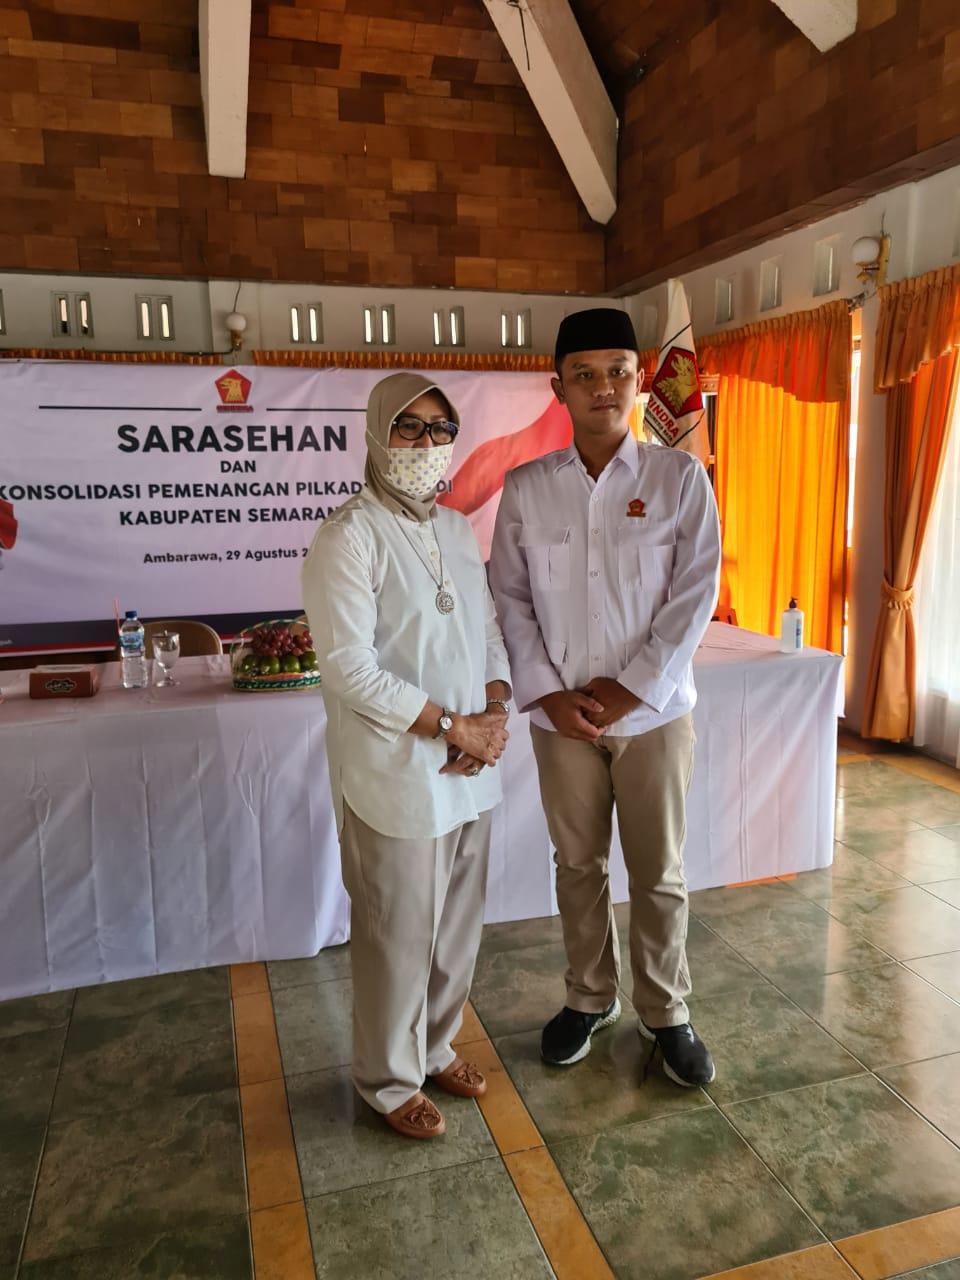 Hj. Bintang Narsasi Mundjirin, S.Pd.